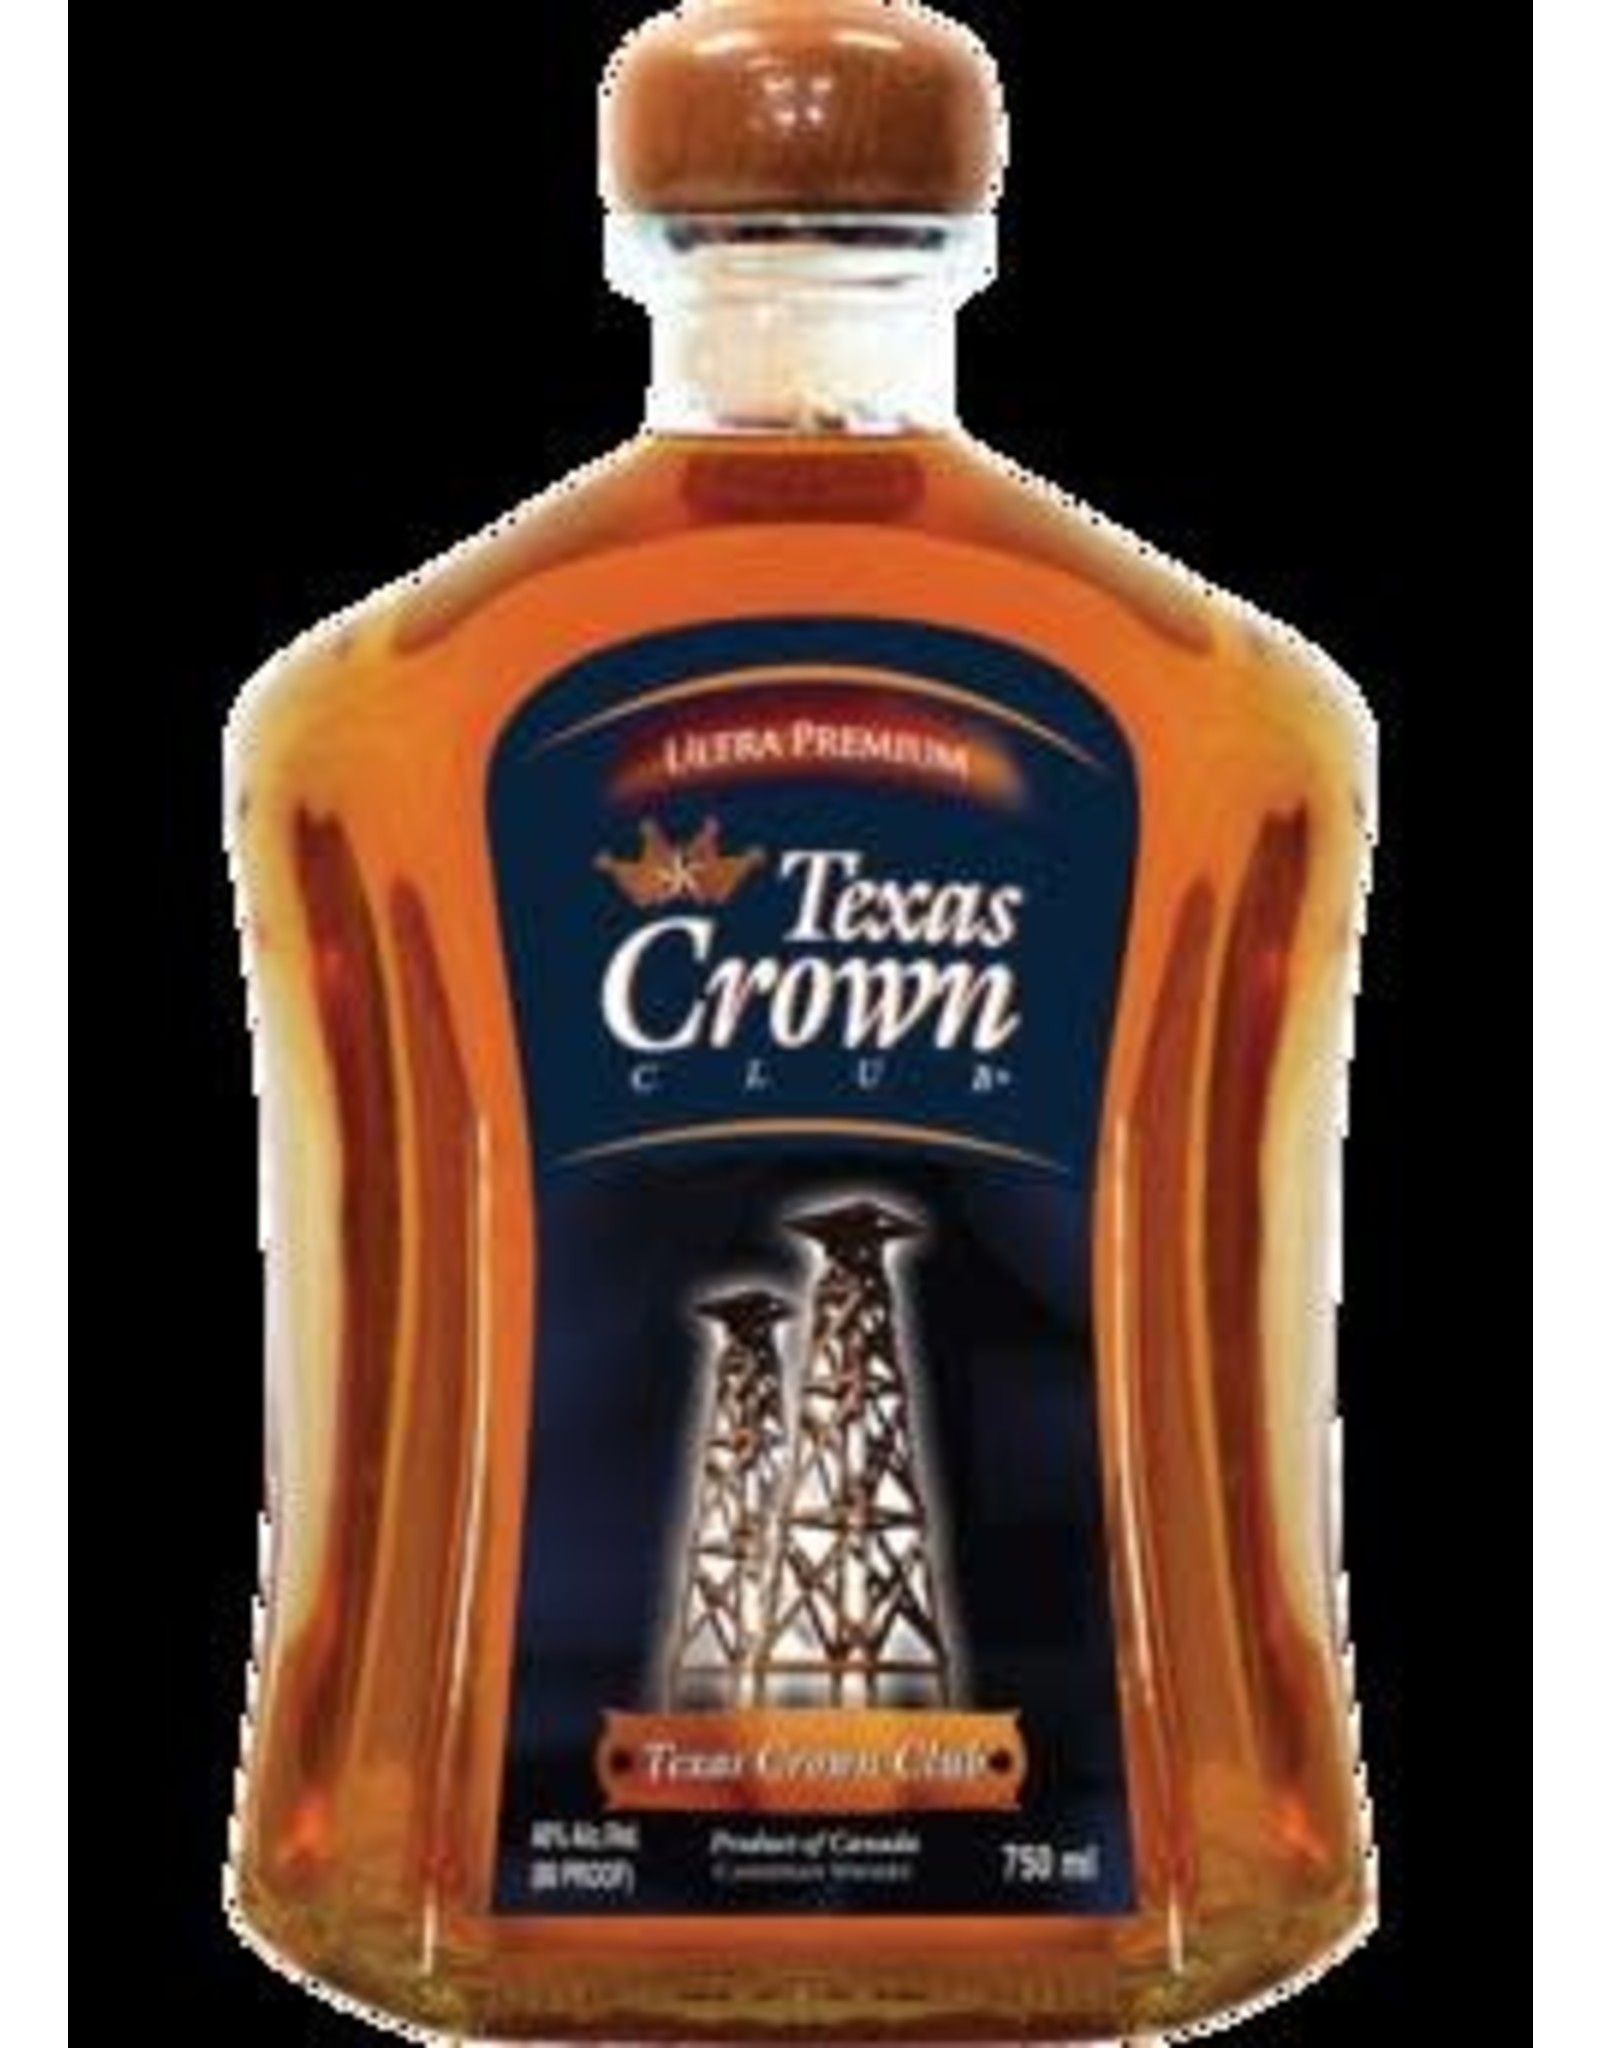 TEXAS CROWN CLUB CANADIAN WHISKY 750ML